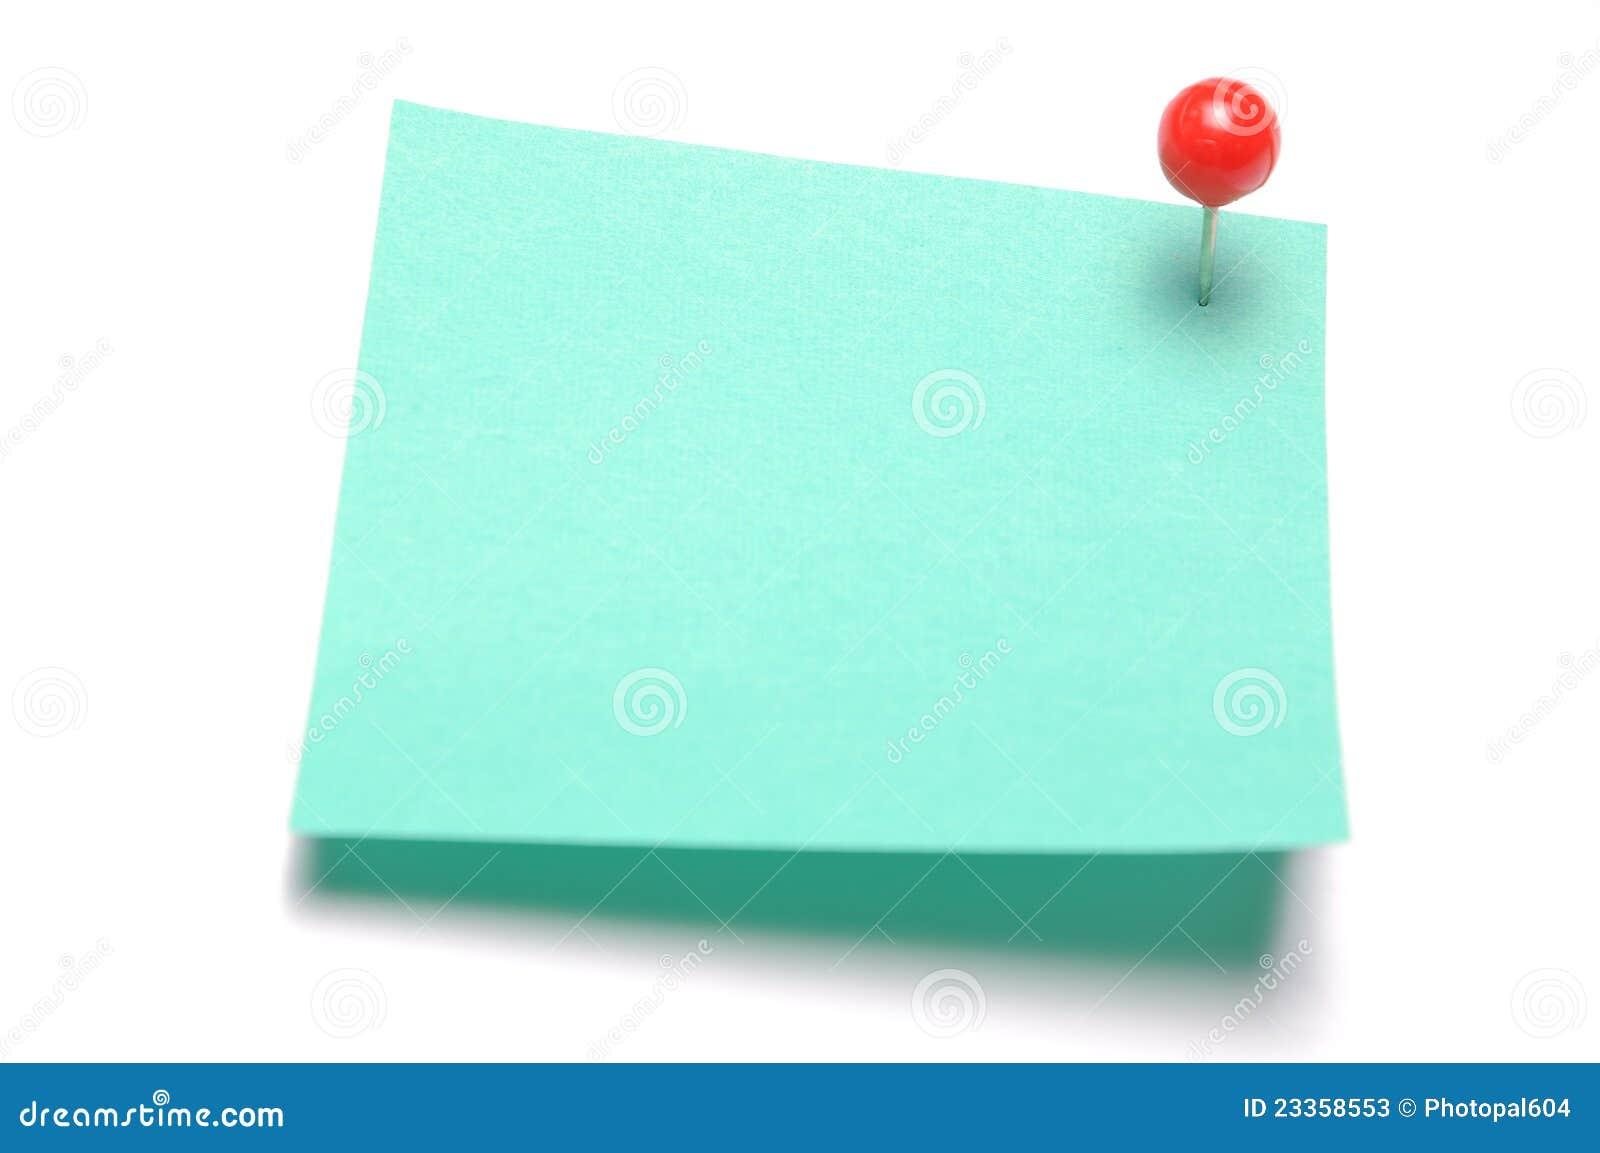 stick notes